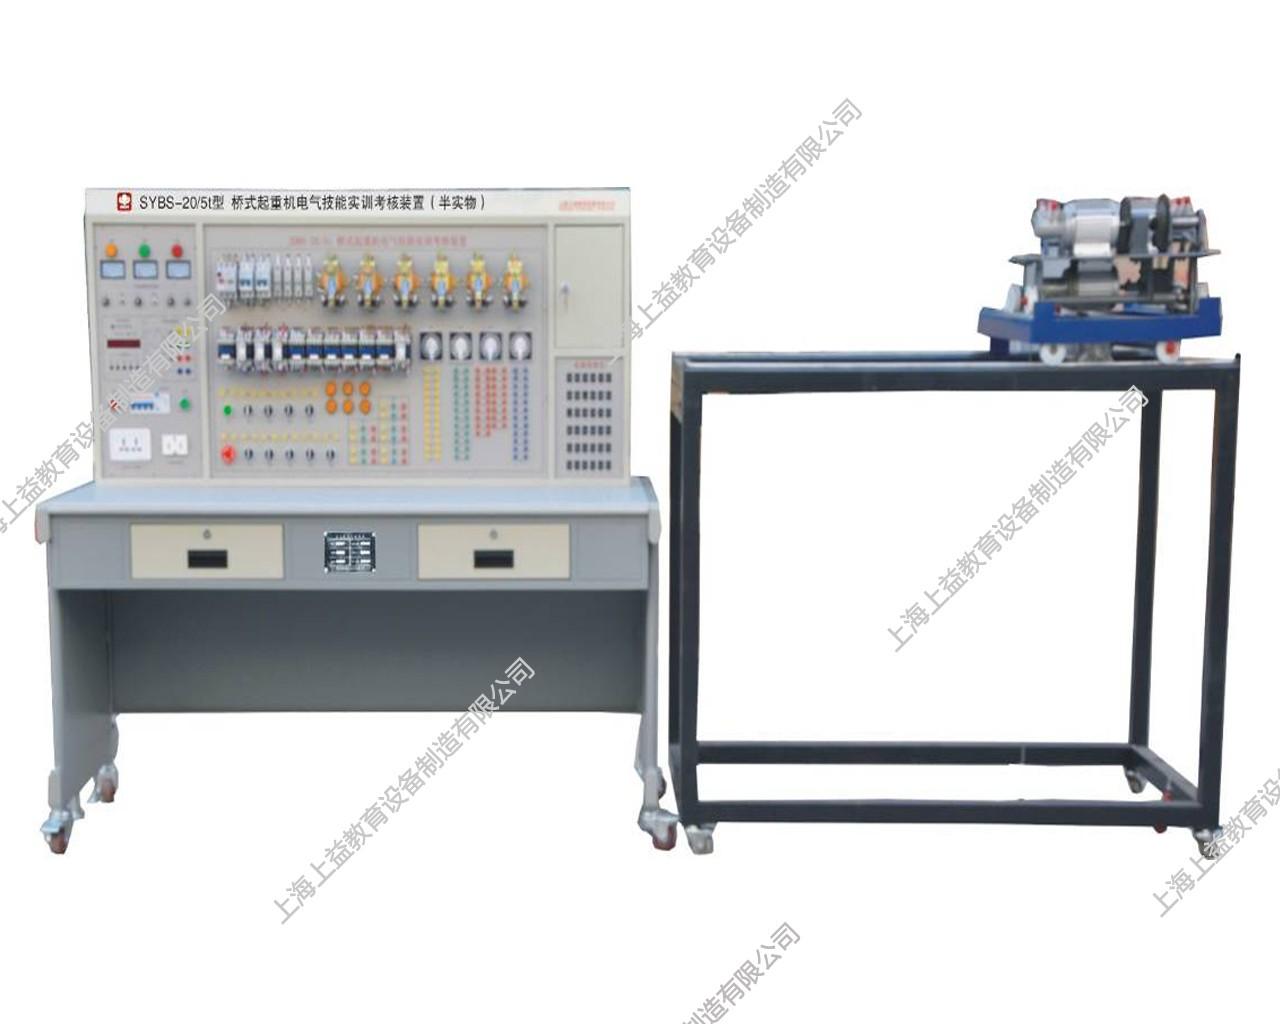 SYBS-20/5t桥式起重机电气技能培训lehu68vipwwwlehu8vip装置(半实物)